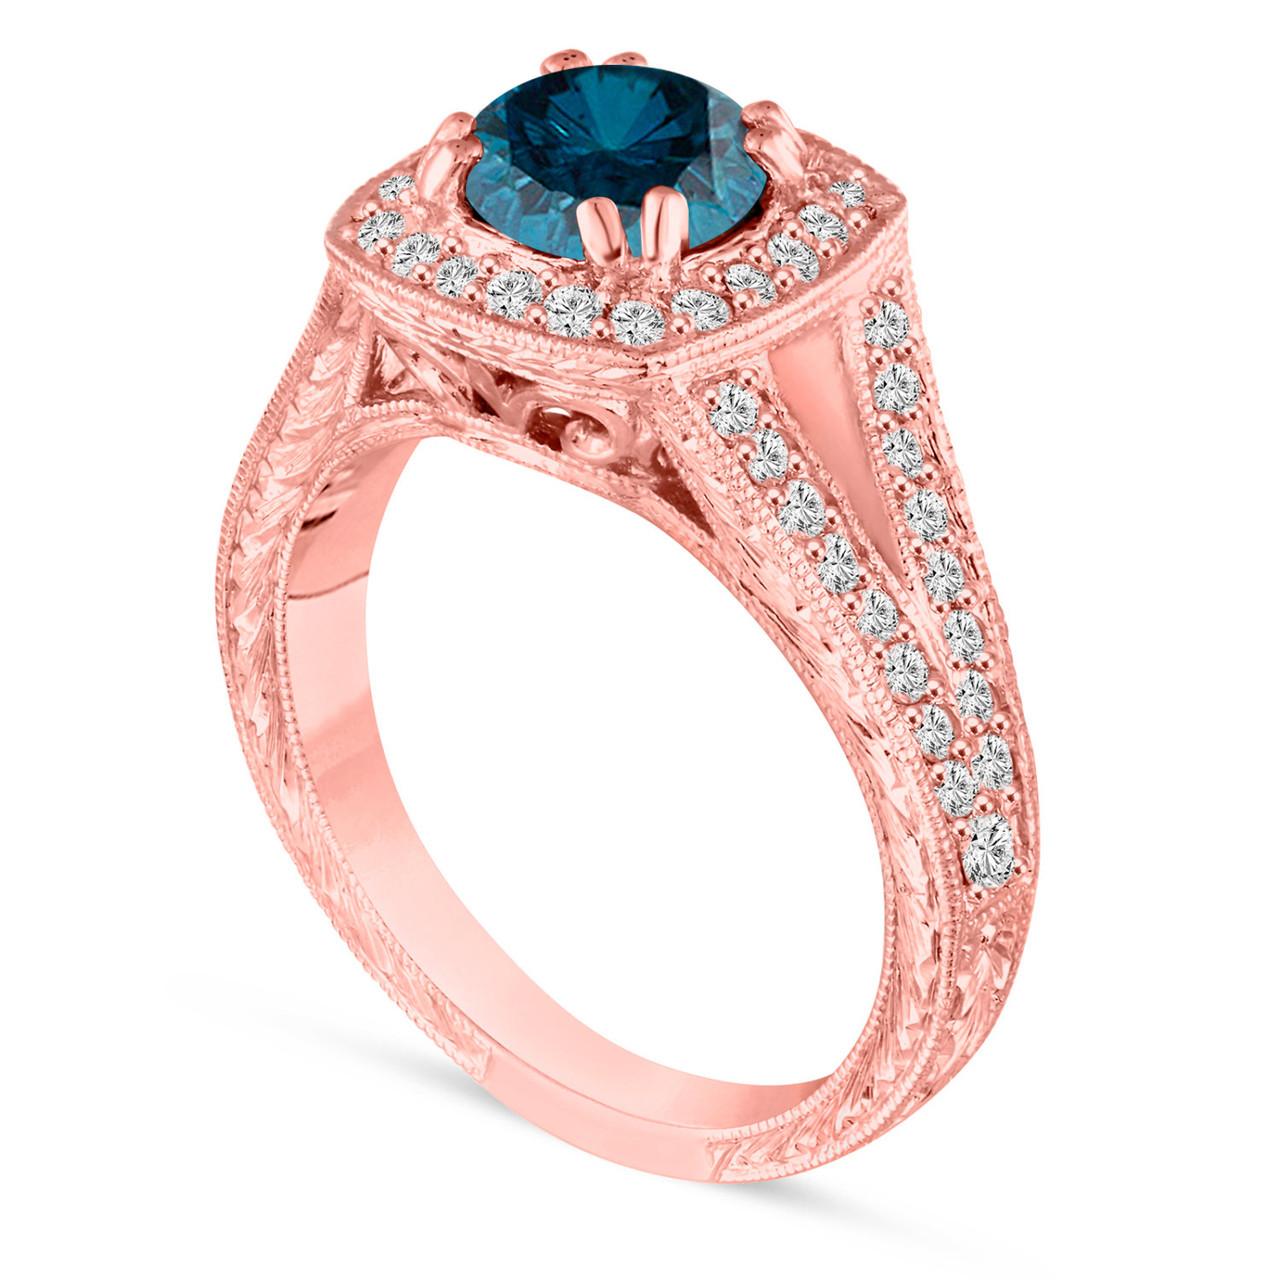 1.56 Carat Blue Diamond Engagement Ring, Unique Wedding Ring 14K ...